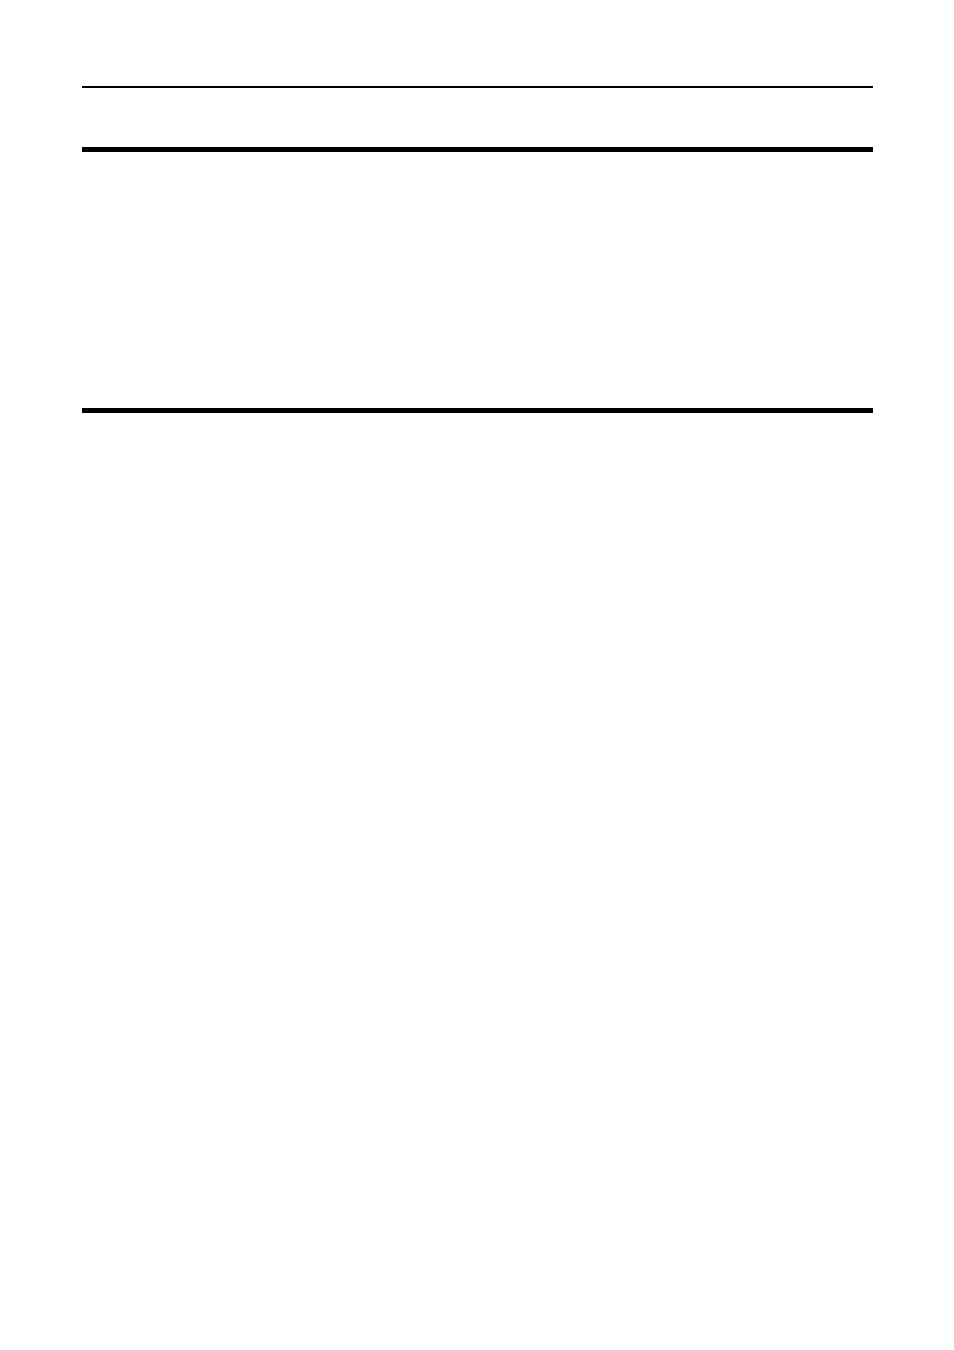 Sensor zeroing, Details editor   MoTeC SDL User Manual